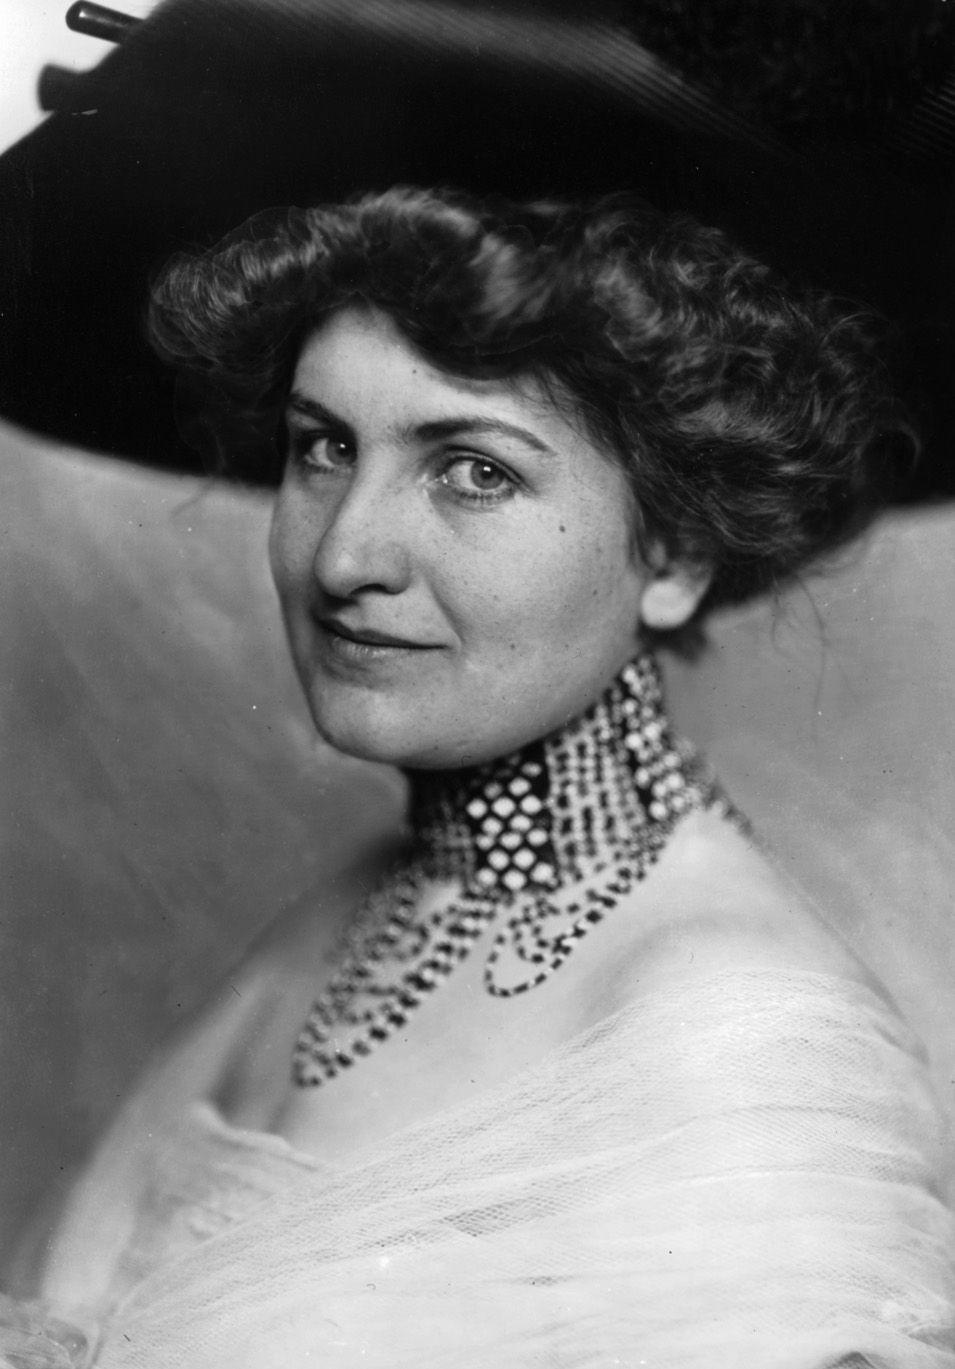 Alma Schindler Mahler Gropius Werfel 1879 1964 Viennese Born